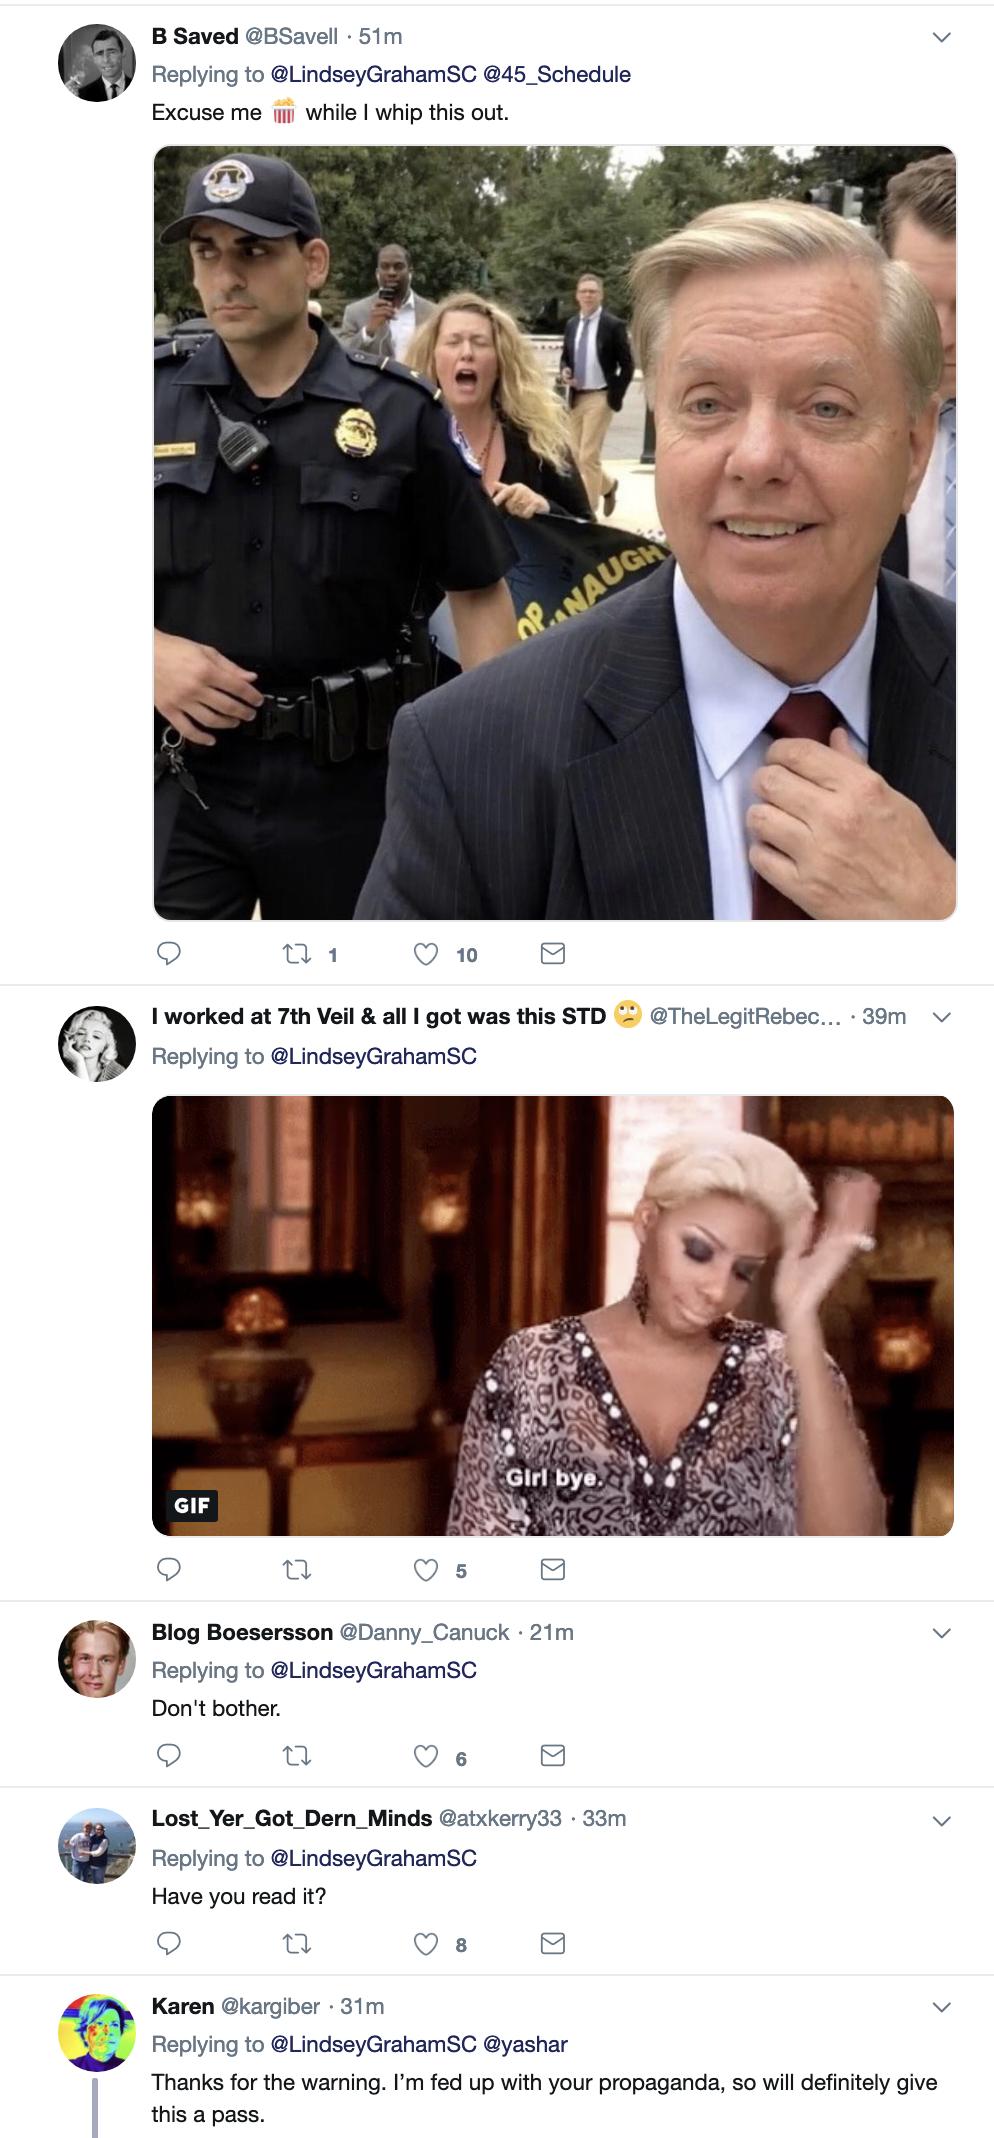 Screen-Shot-2019-03-25-at-8.53.06-AM Graham Makes Mueller Report Announcement On Twitter Monday Corruption Crime Donald Trump Election 2016 Mueller Politics Robert Mueller Russia Top Stories